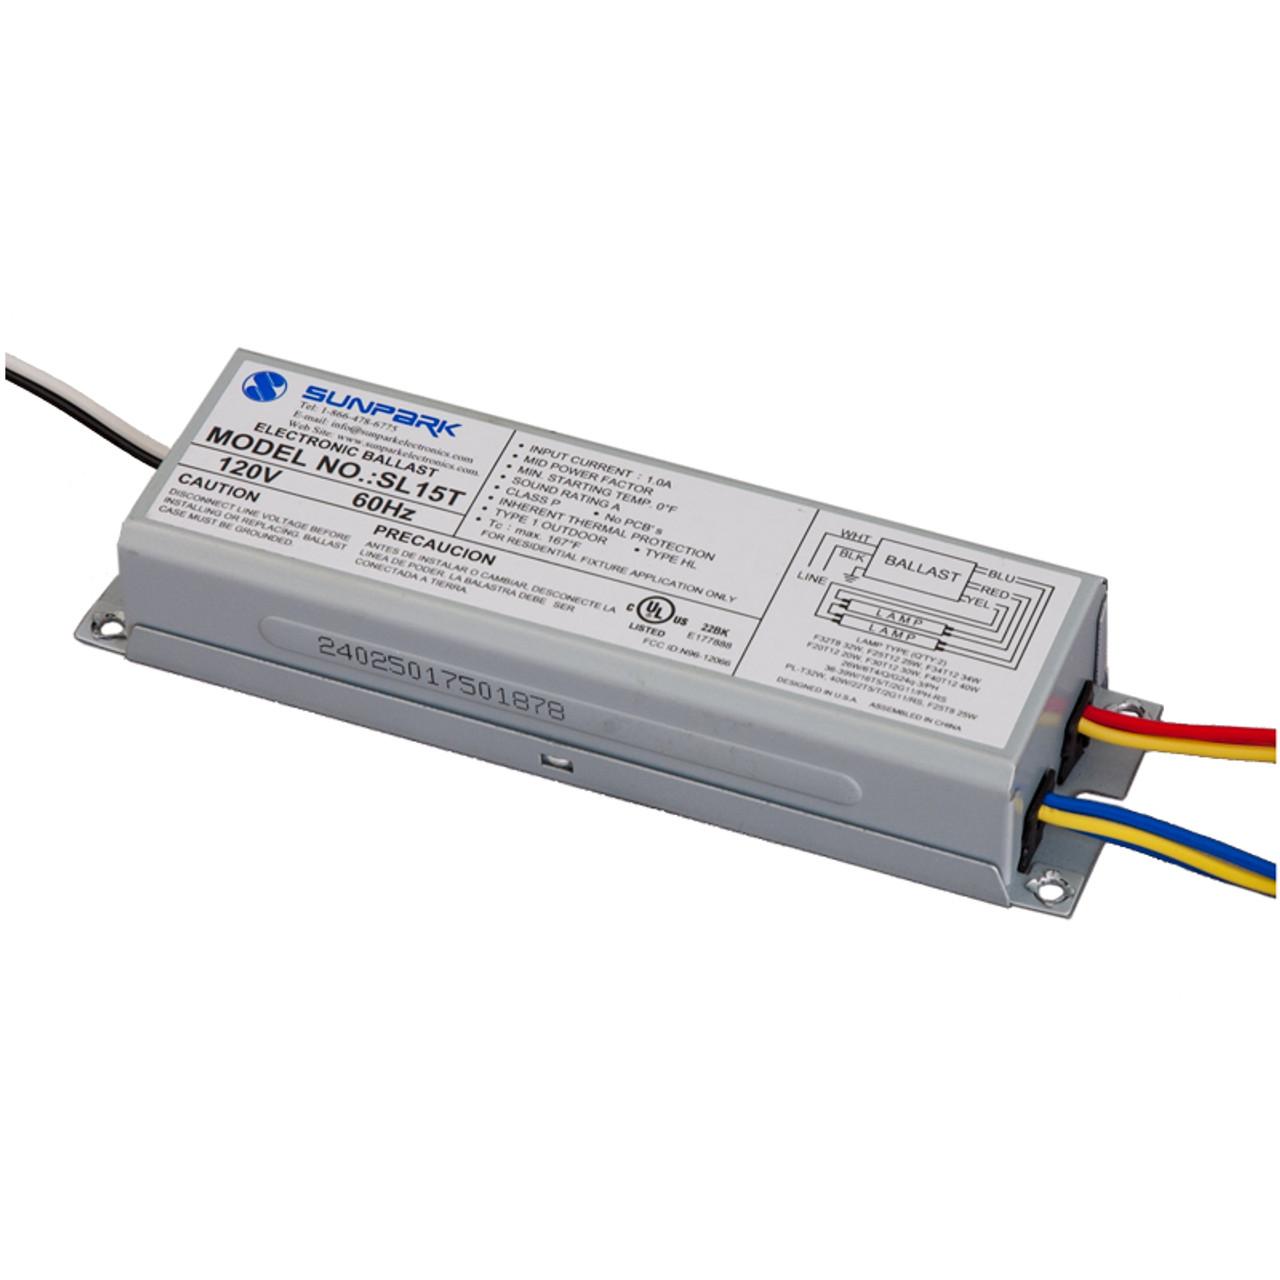 hight resolution of sunpark sl15t electronic replacement ballast sunpark sl15t ballast wiring diagram